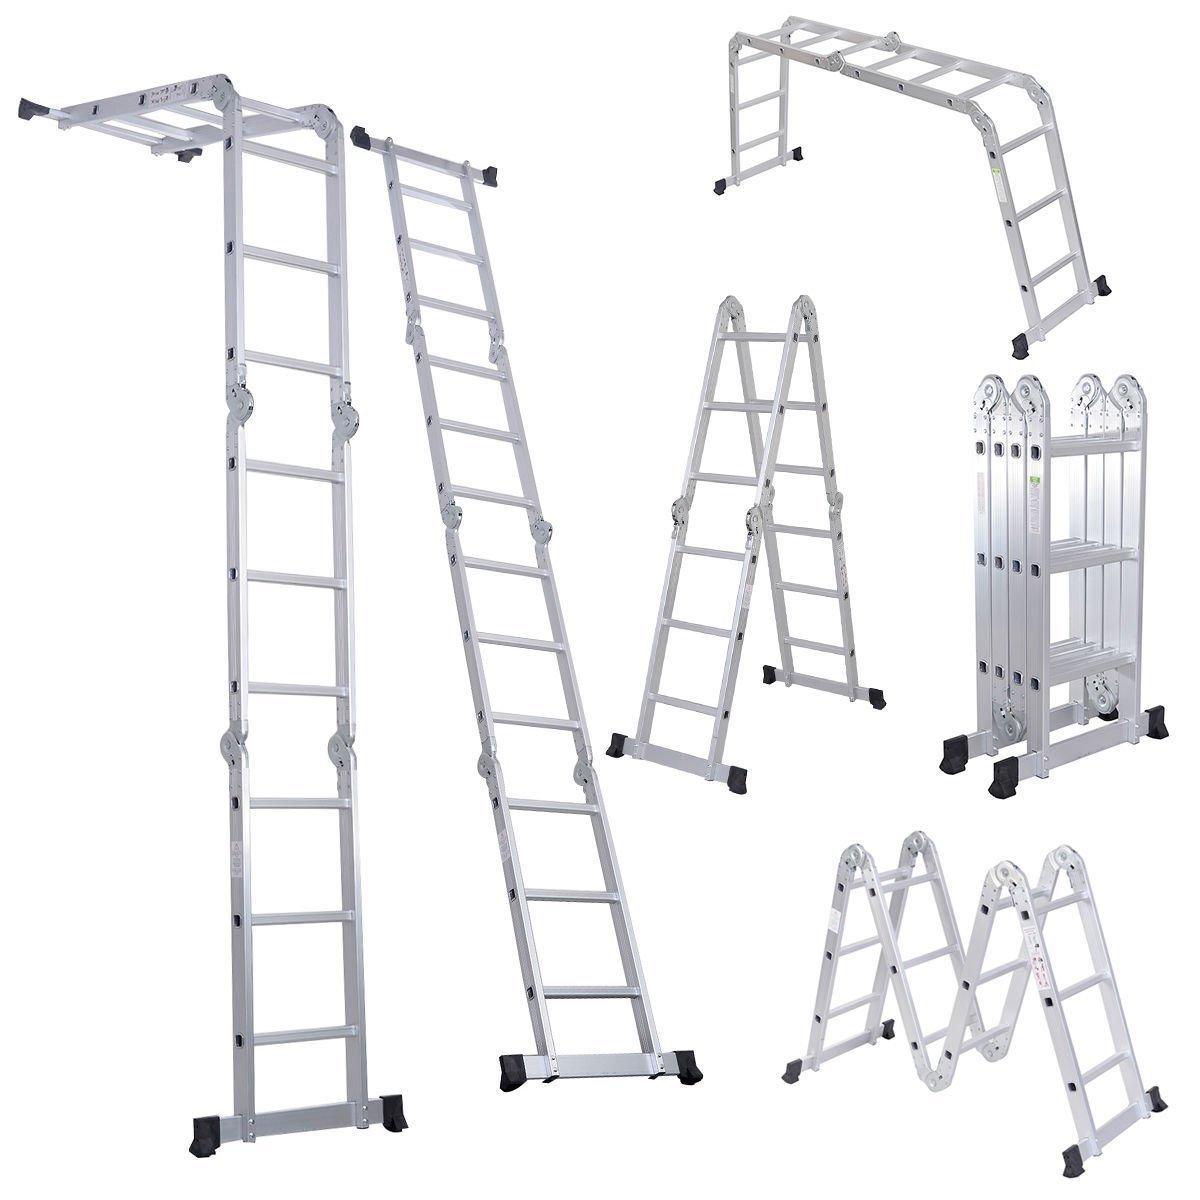 Luisladders 12.5 Feet Aluminum Multi-Purpose Folding Extendable Step Ladder Safety Locking Hinges 330 Pound Capacity Anti-slip Design